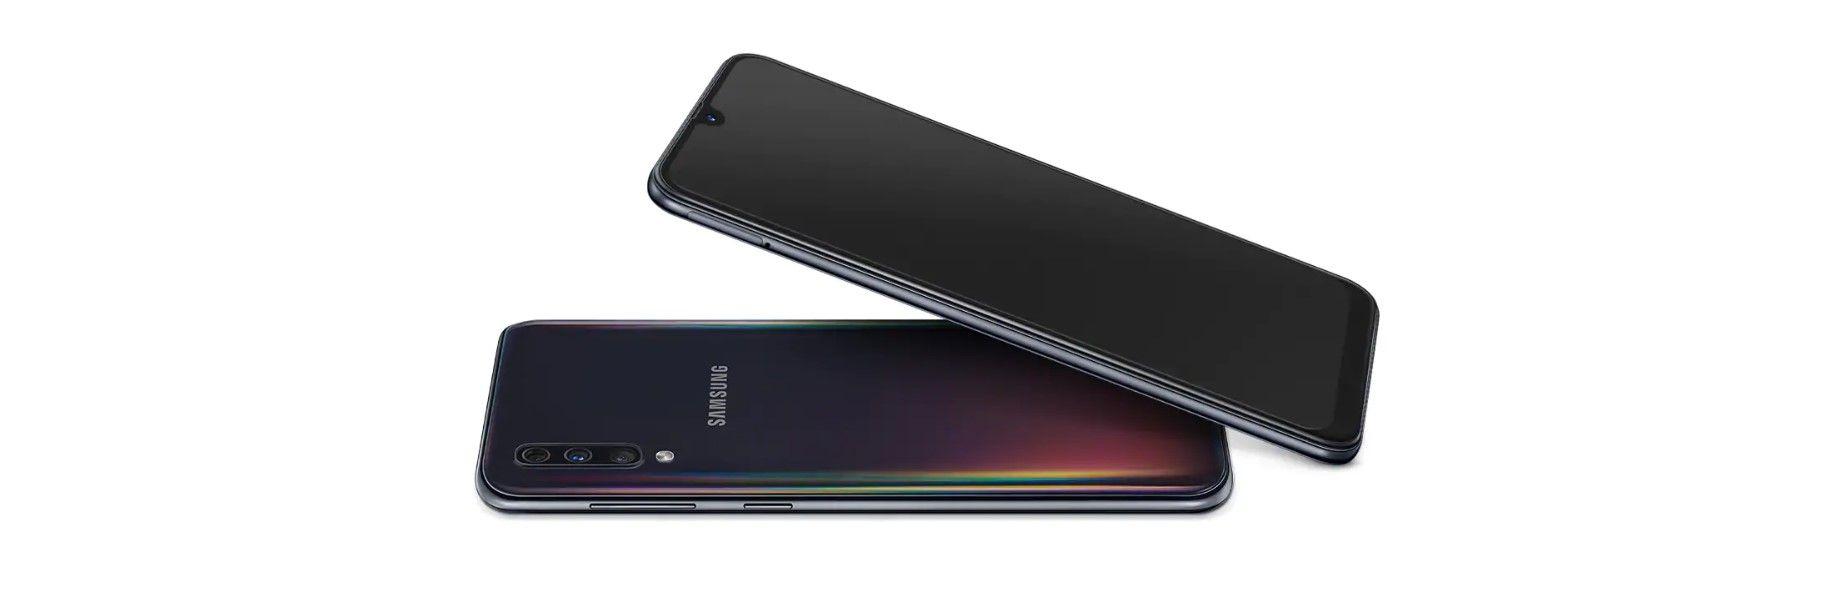 Samsung Galaxy A50 цвета